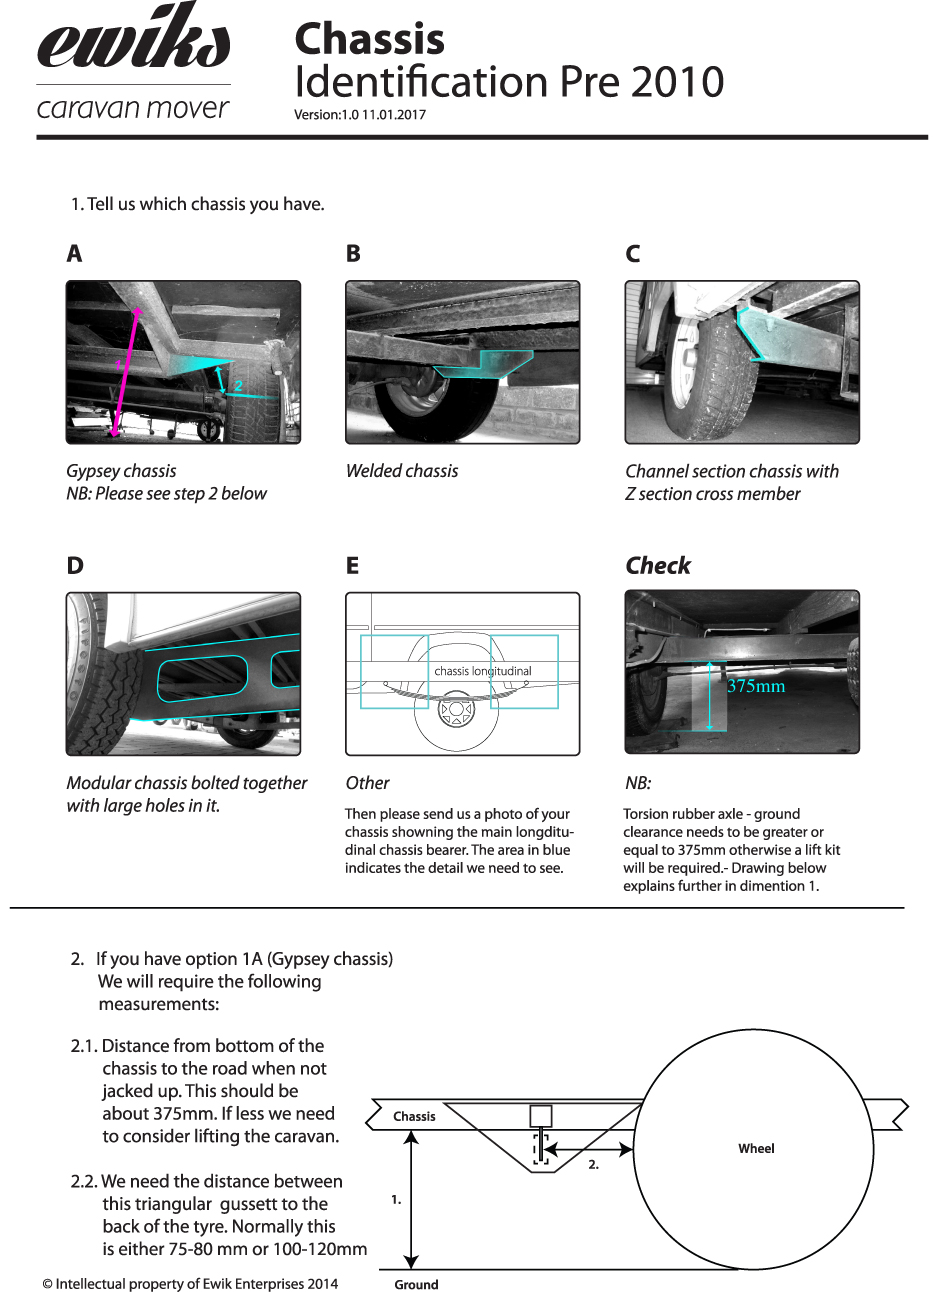 Caravan Chassis Identification Pre 2010